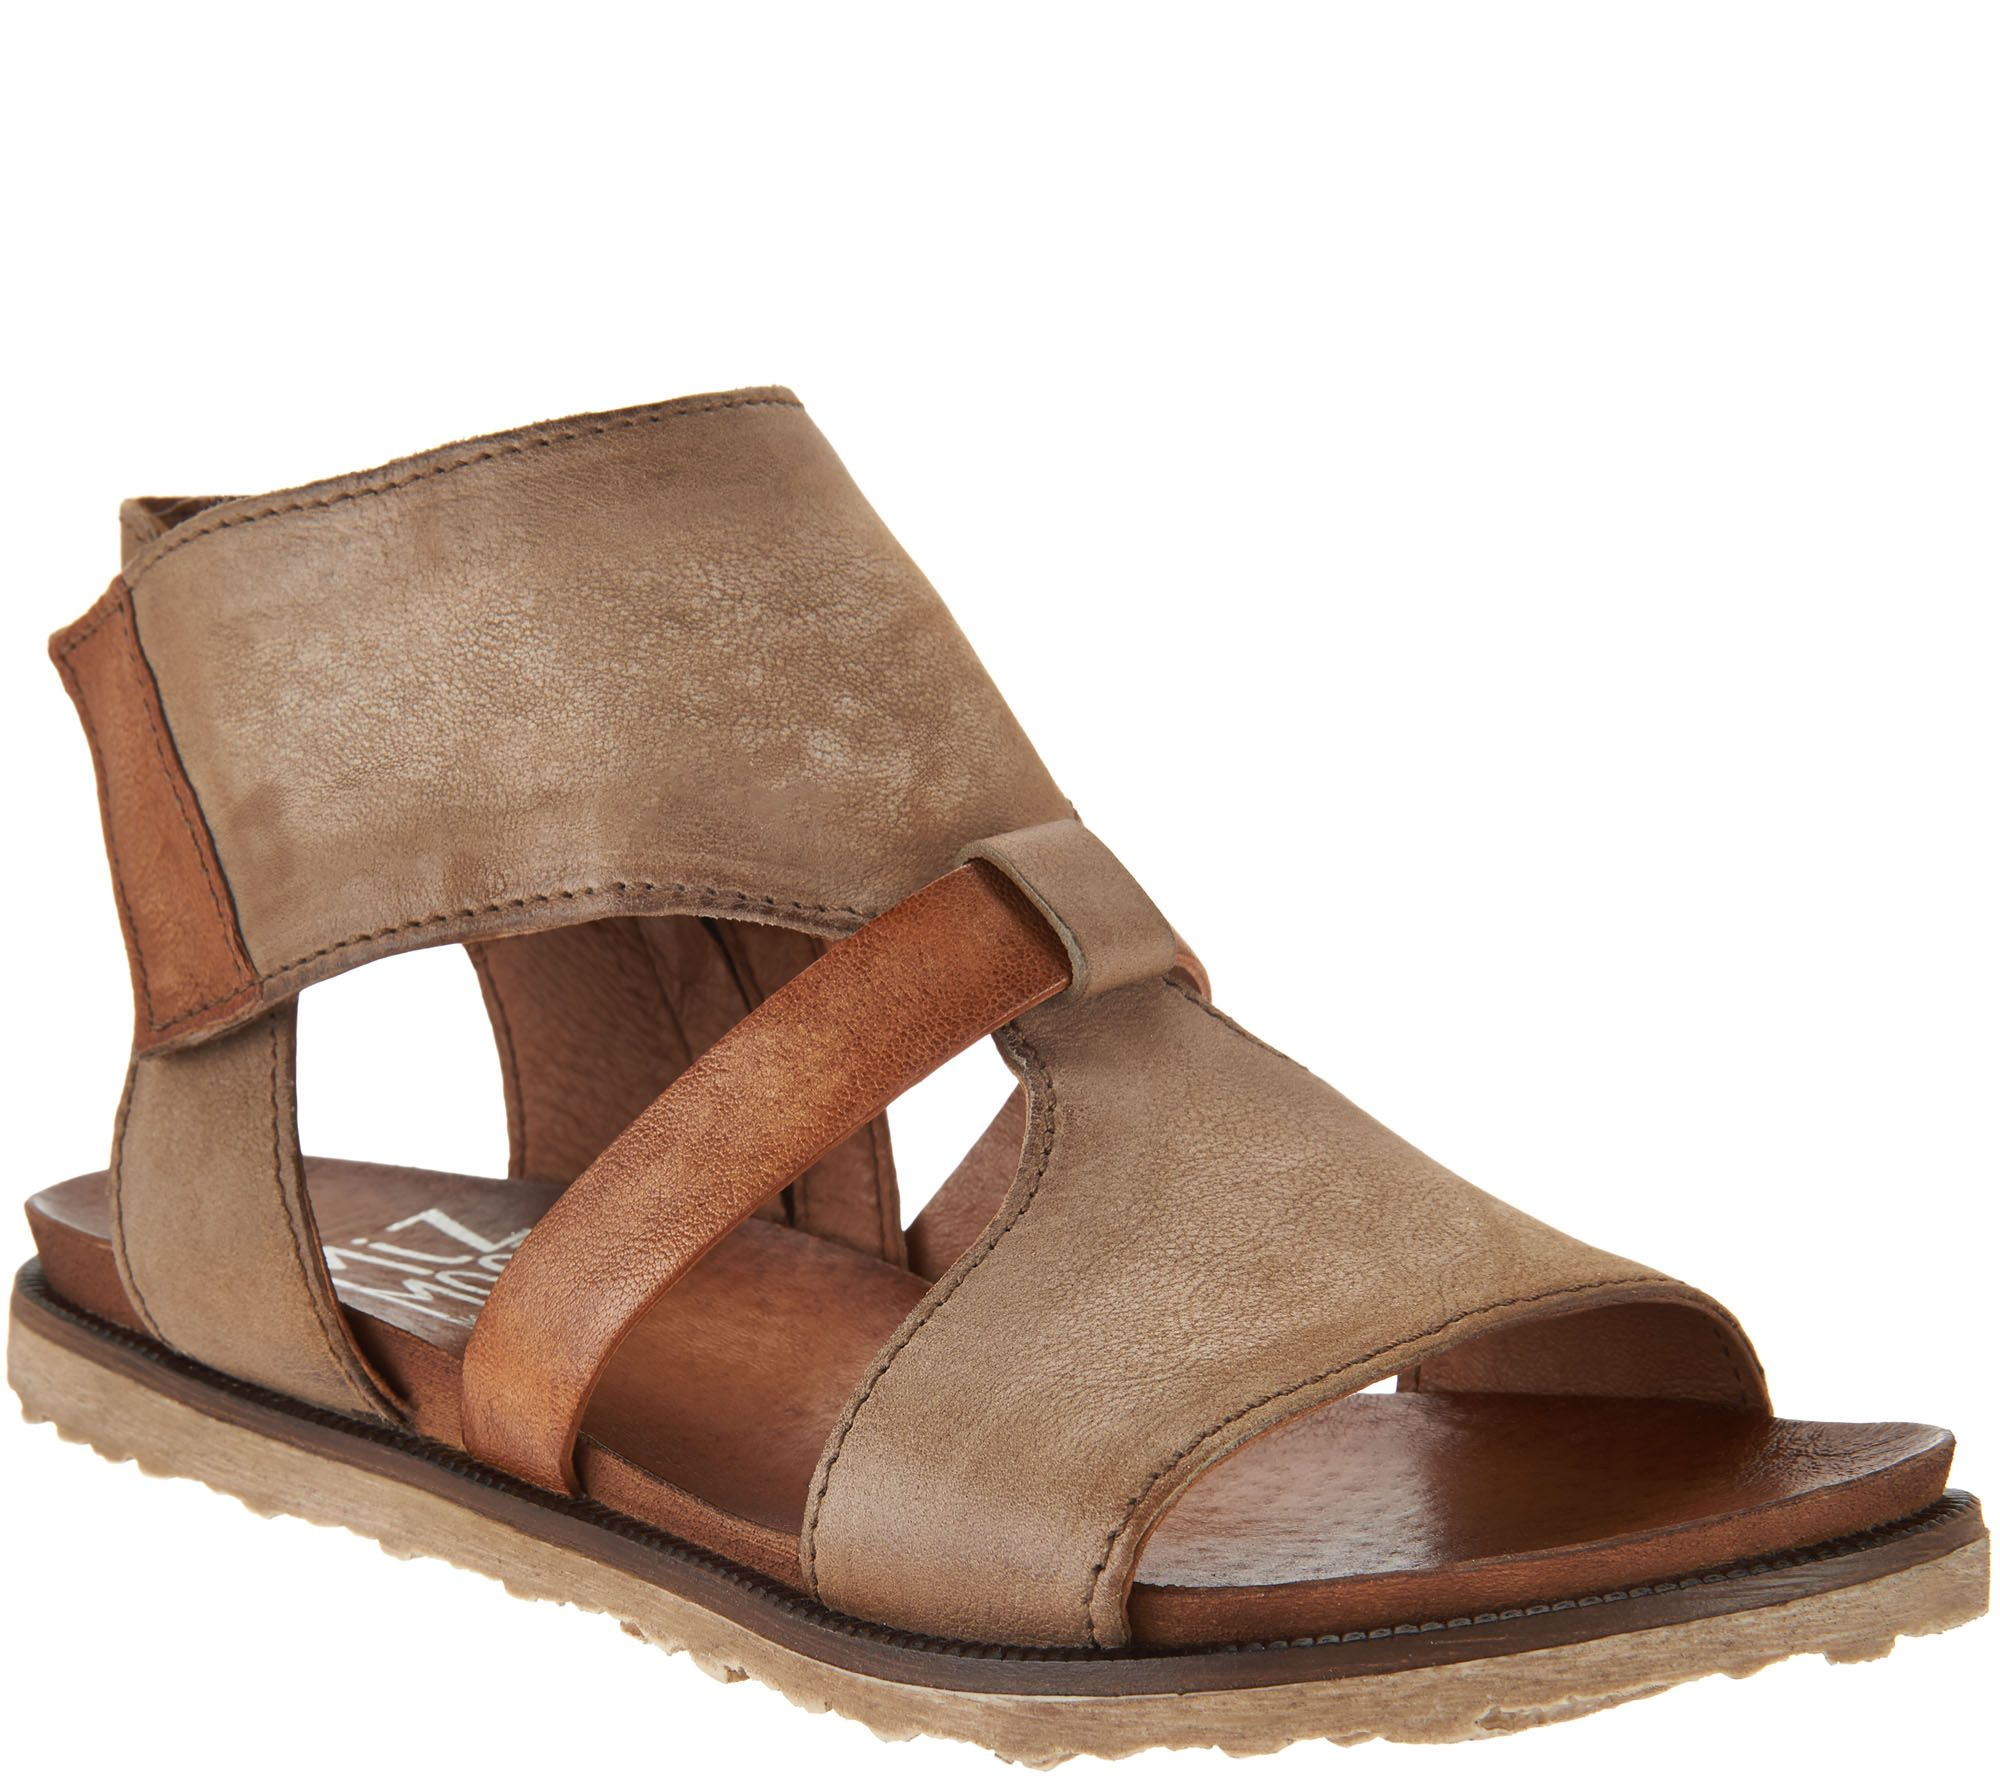 154527099ca5 Miz Mooz Leather Cut-out Sandals - Tamsyn - Page 1 — QVC.com